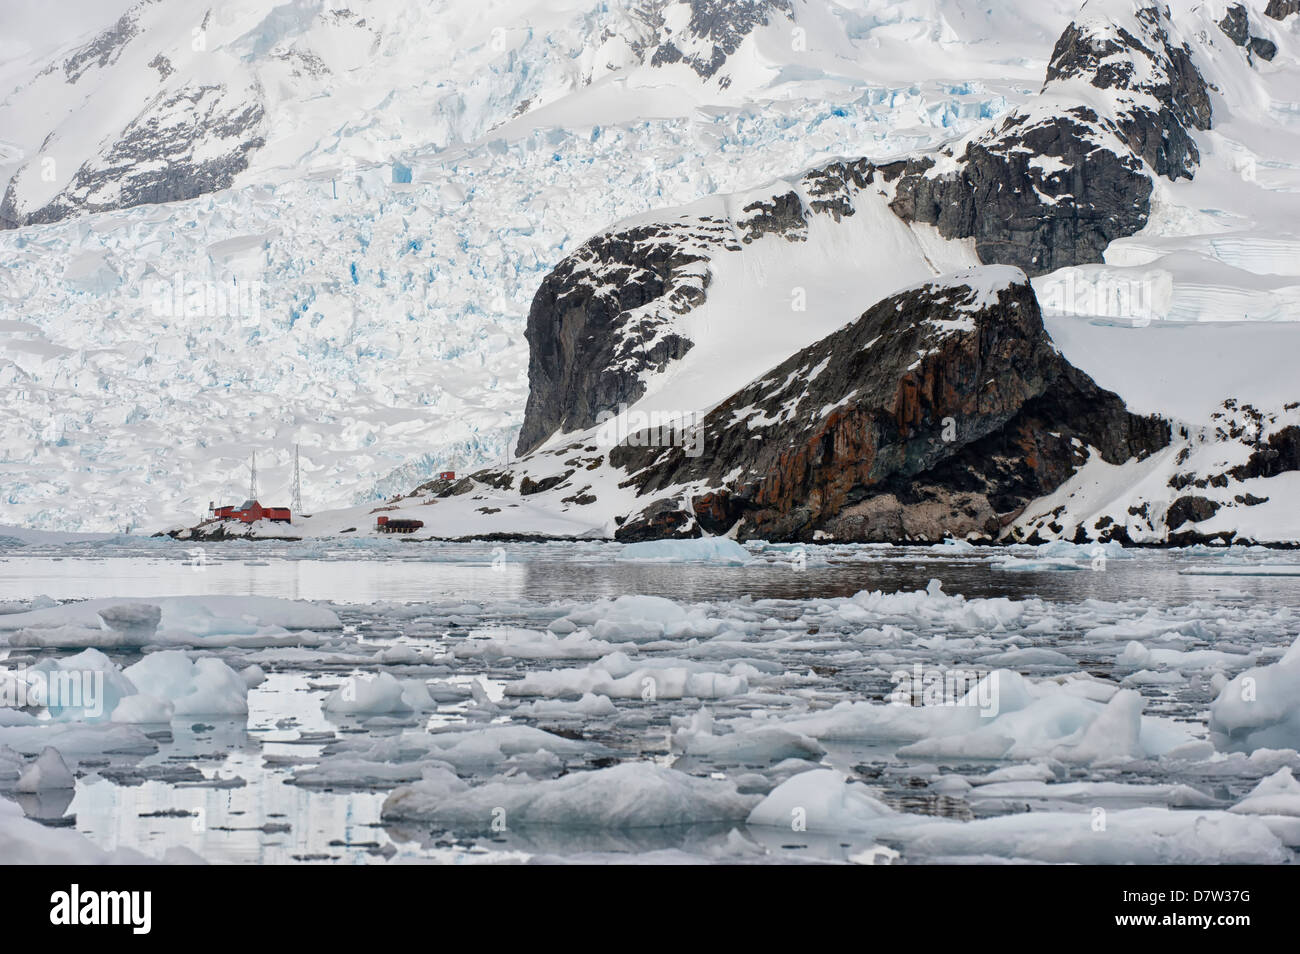 Bahia Paraiso (Paradise Bay), Almirante Brown Argentinean station, Antarctic Peninsula, Antarctica - Stock Image